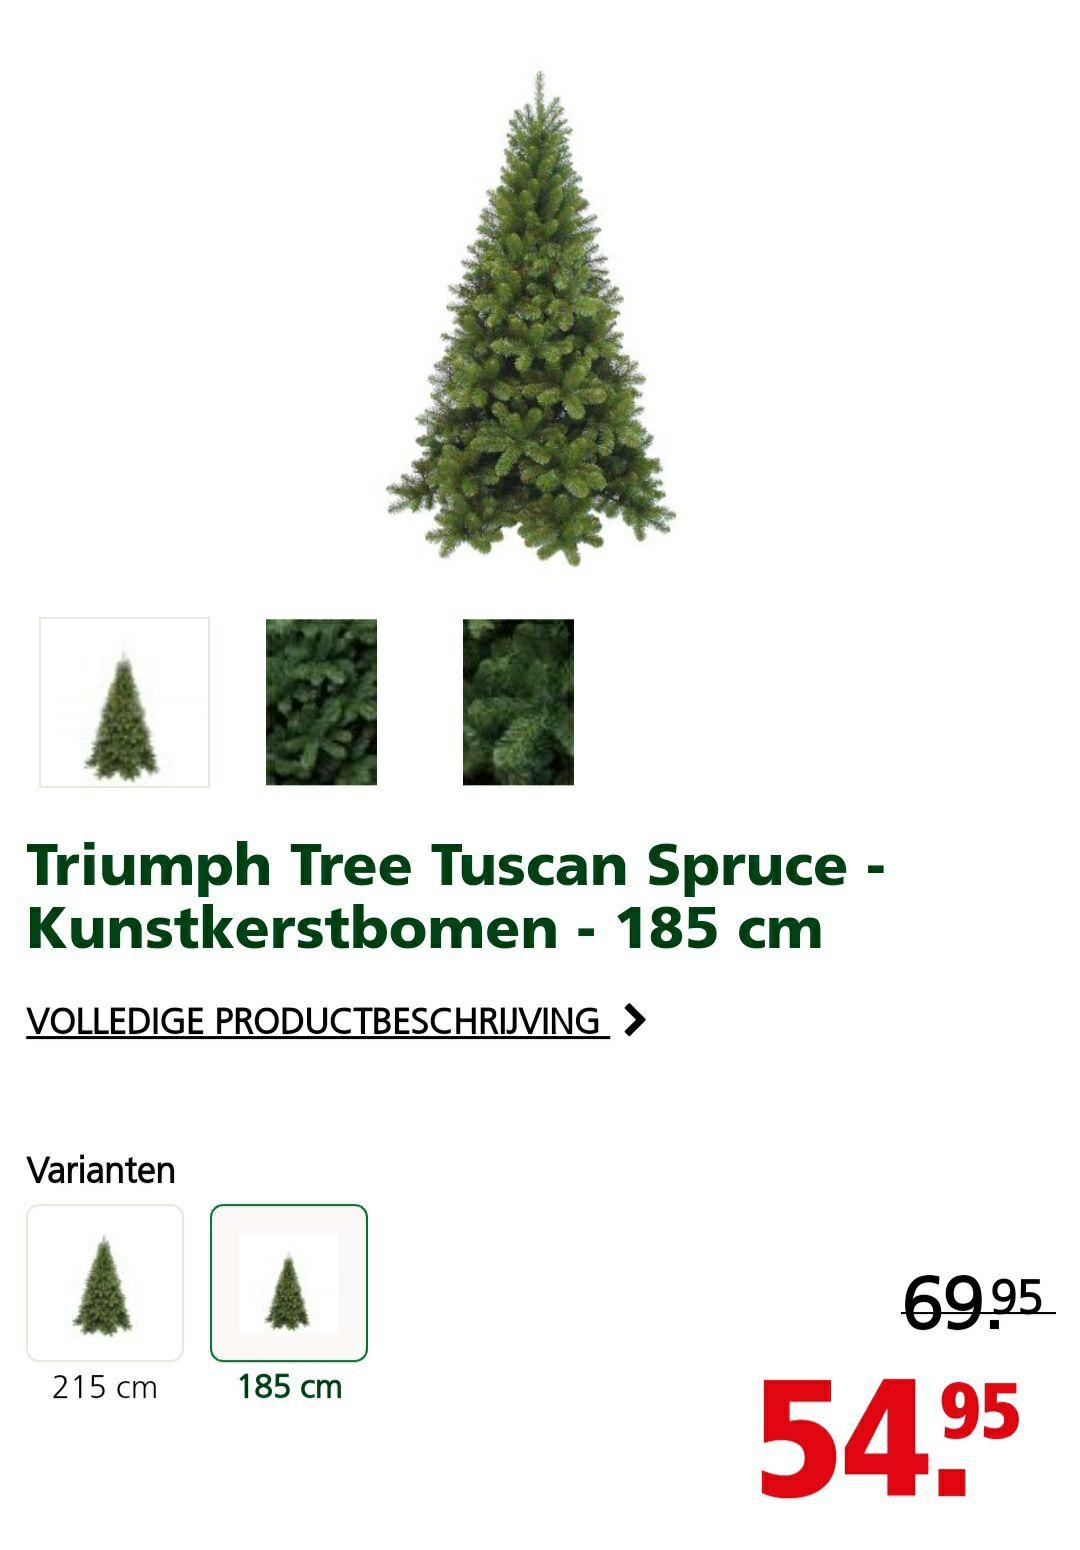 Triumph Tree Tuscan Spruce - Kunstkerstbomen insteek constructie 185 cm